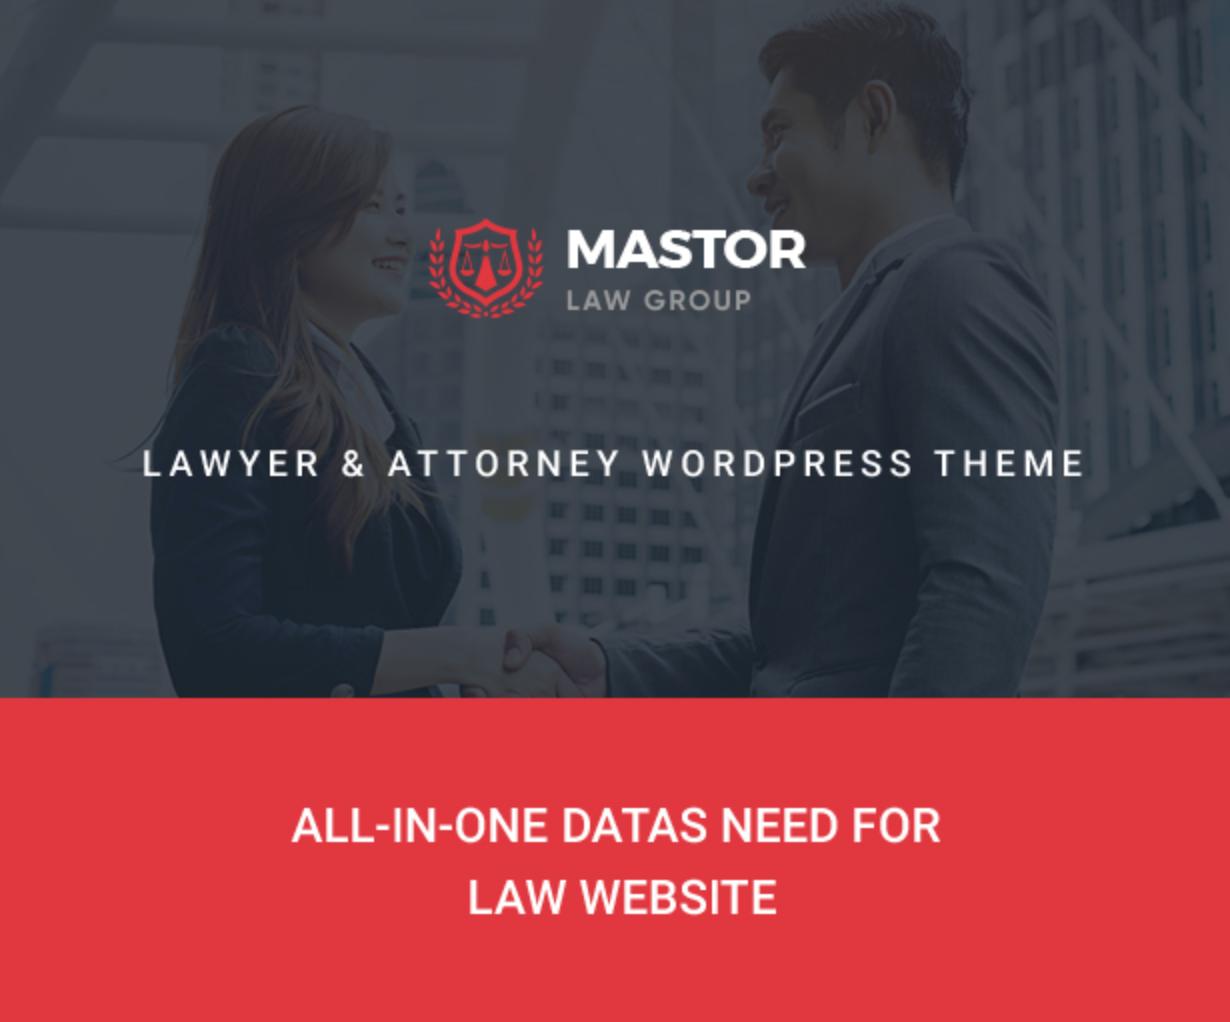 Mastor - Law, Firm & Legal Attorney WordPress Theme